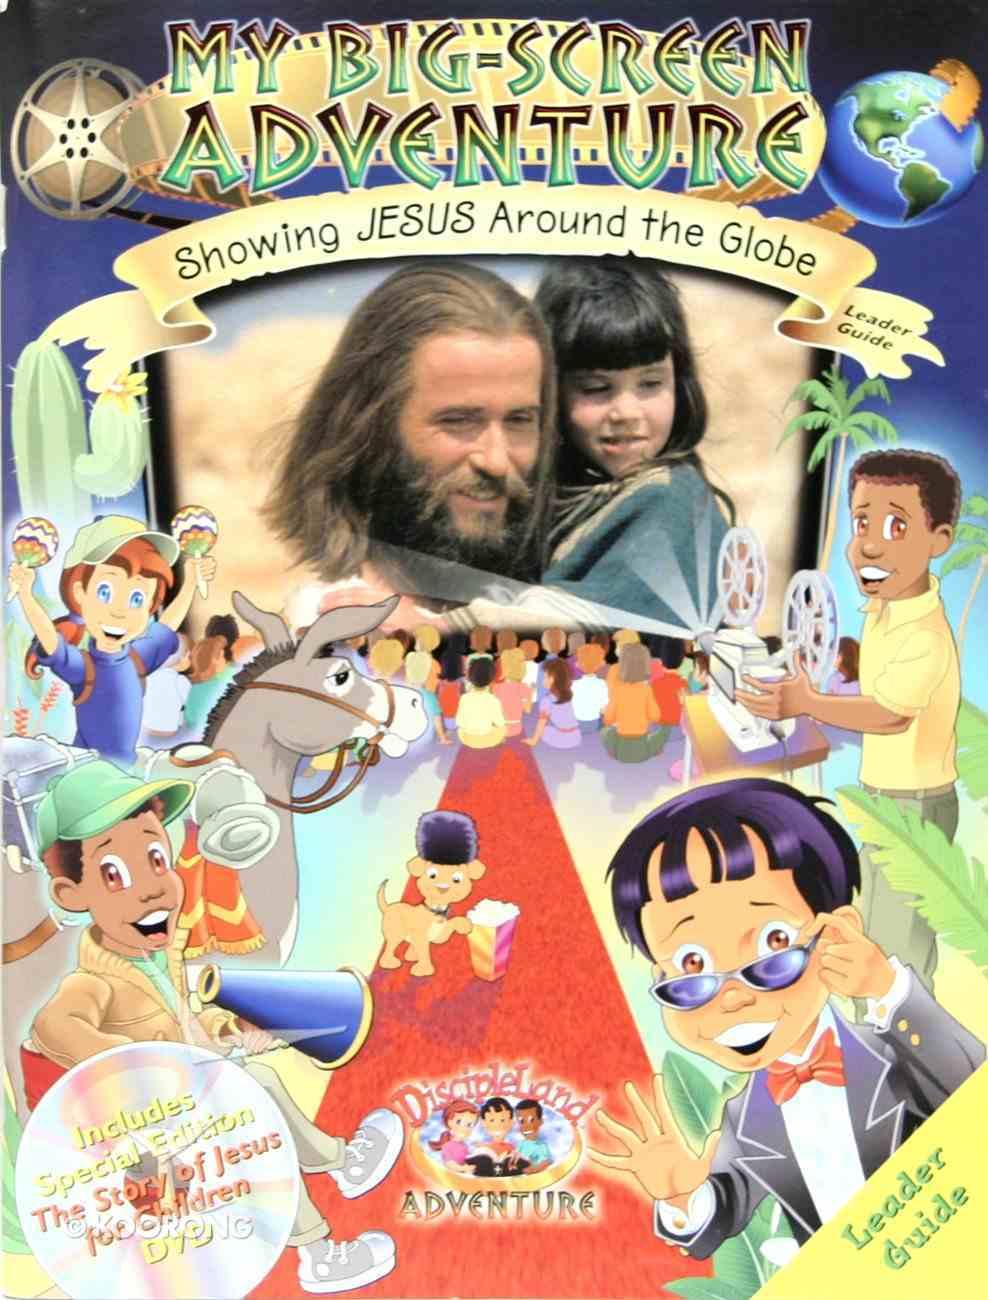 Dlc My Big-Screen Adventure Ages 6-12 (Leader) (Discipleland Curriculum Series) Paperback